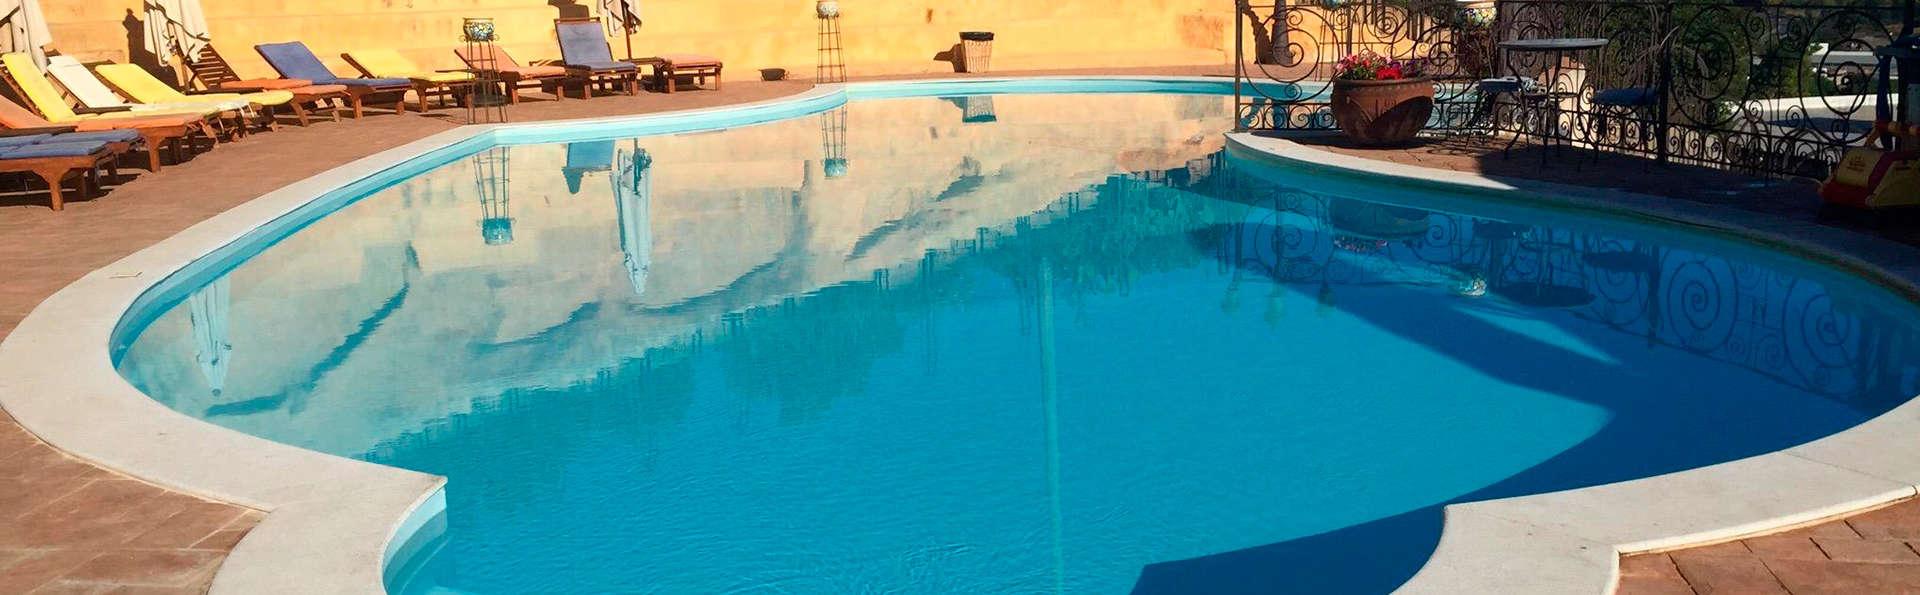 Alójate en un art-hotel junto a la famosa reserva de Zingaro